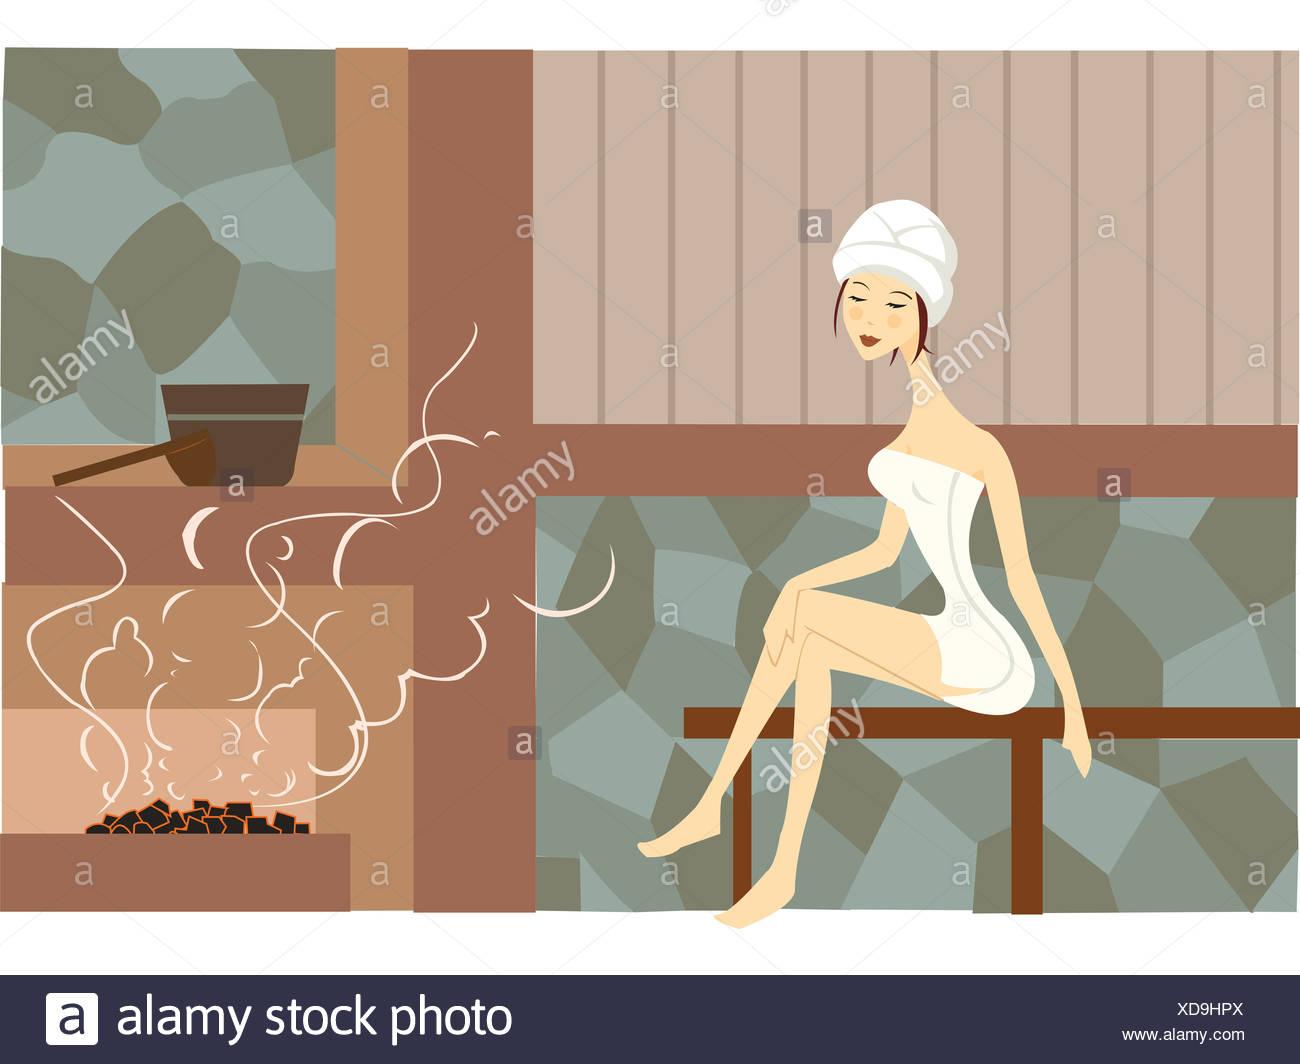 person bath cartoon stockfotos person bath cartoon bilder seite 2 alamy. Black Bedroom Furniture Sets. Home Design Ideas